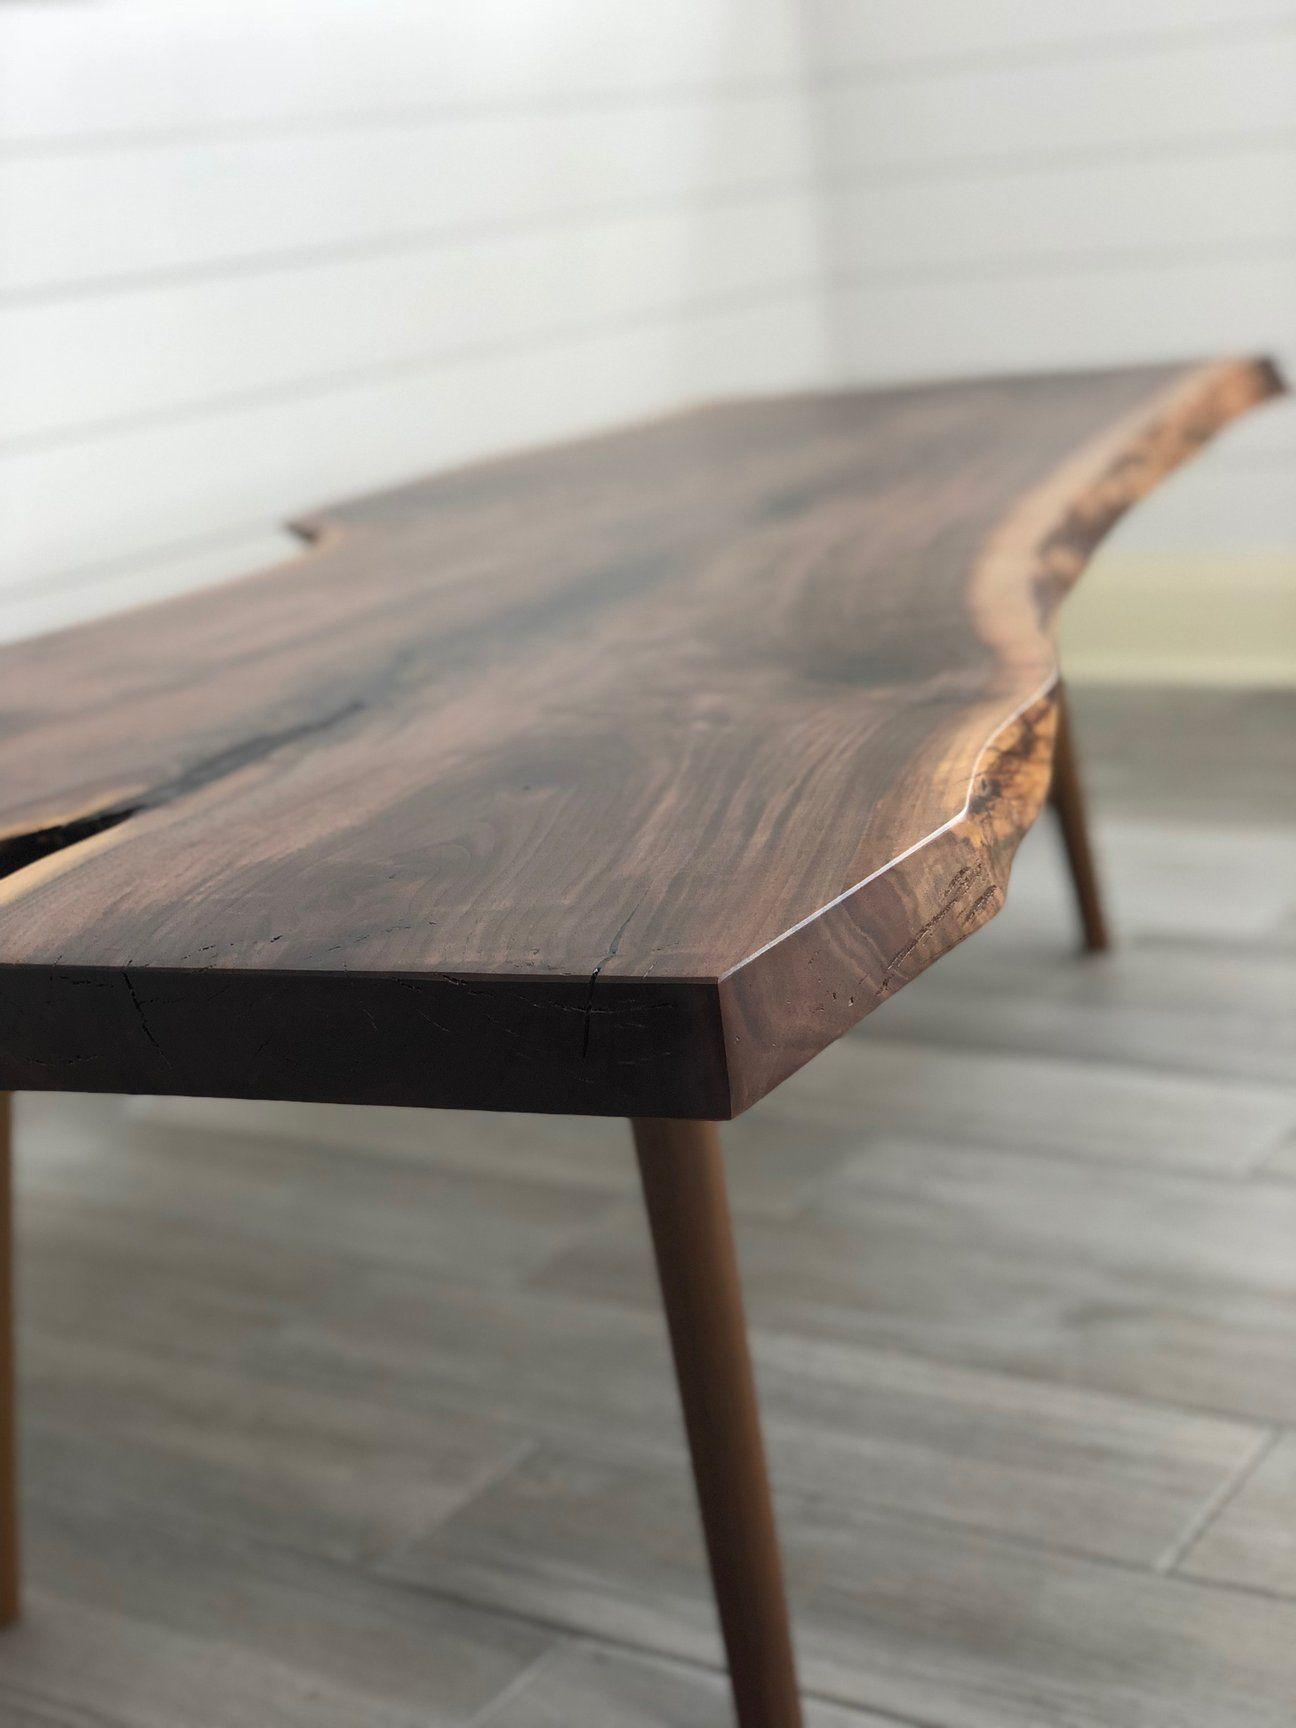 Live Edge Coffee Table Live Edge Wood Table Live Edge Coffee Table Raw Wood Coffee Table [ 1728 x 1296 Pixel ]